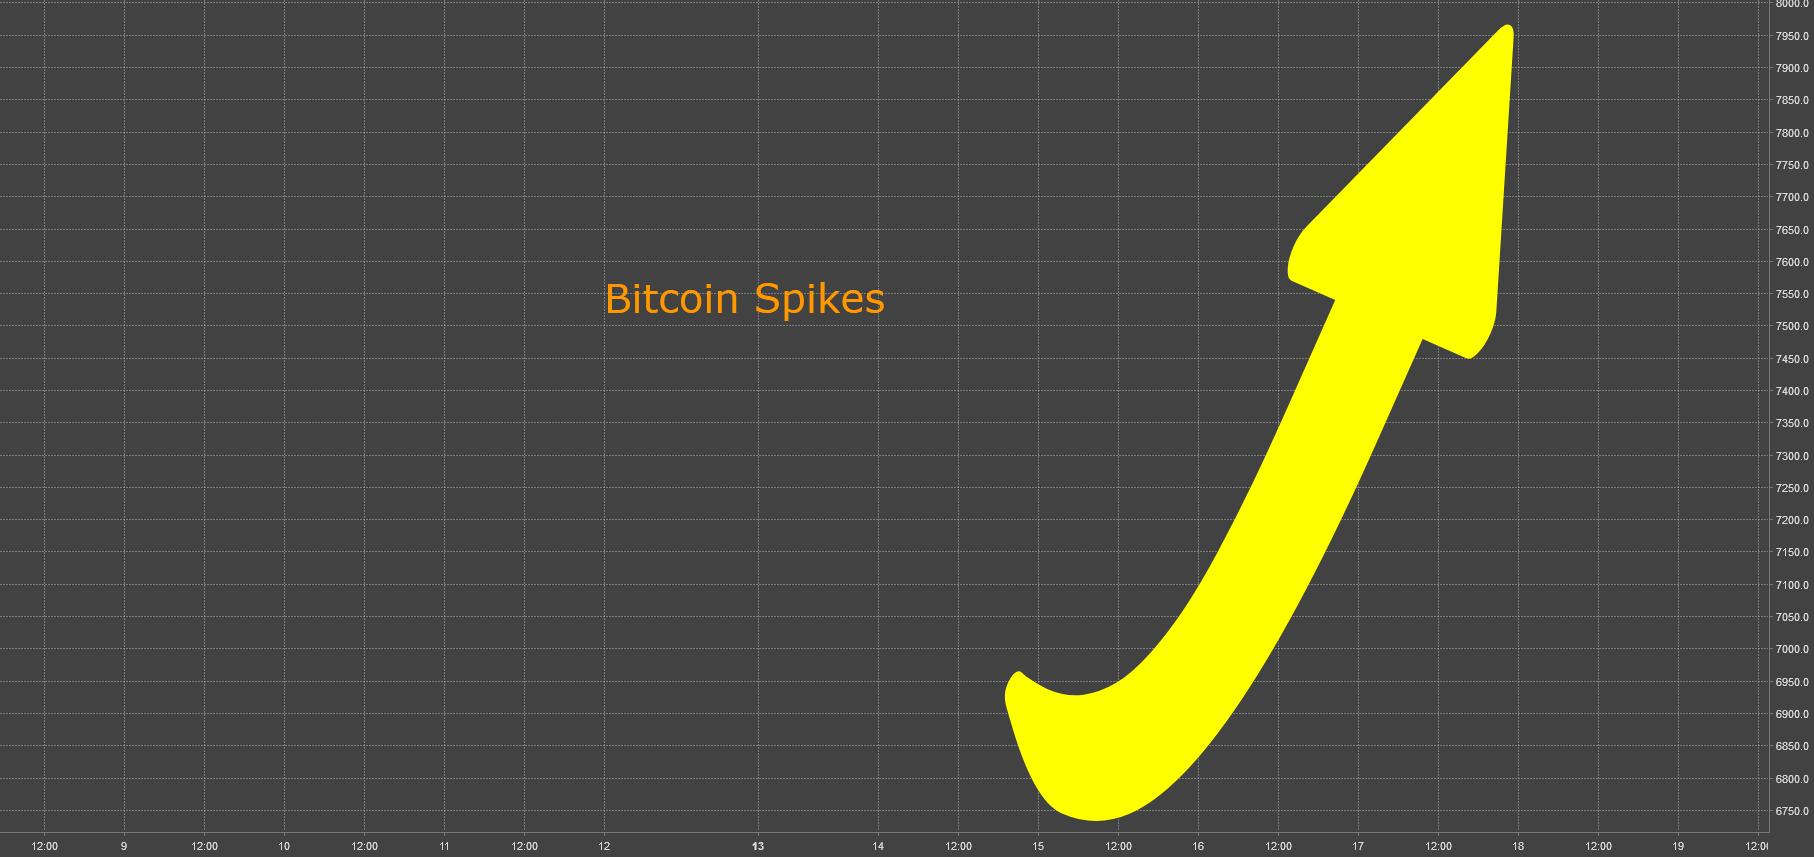 No Way Out LI (51) - Bitcoin Spikes